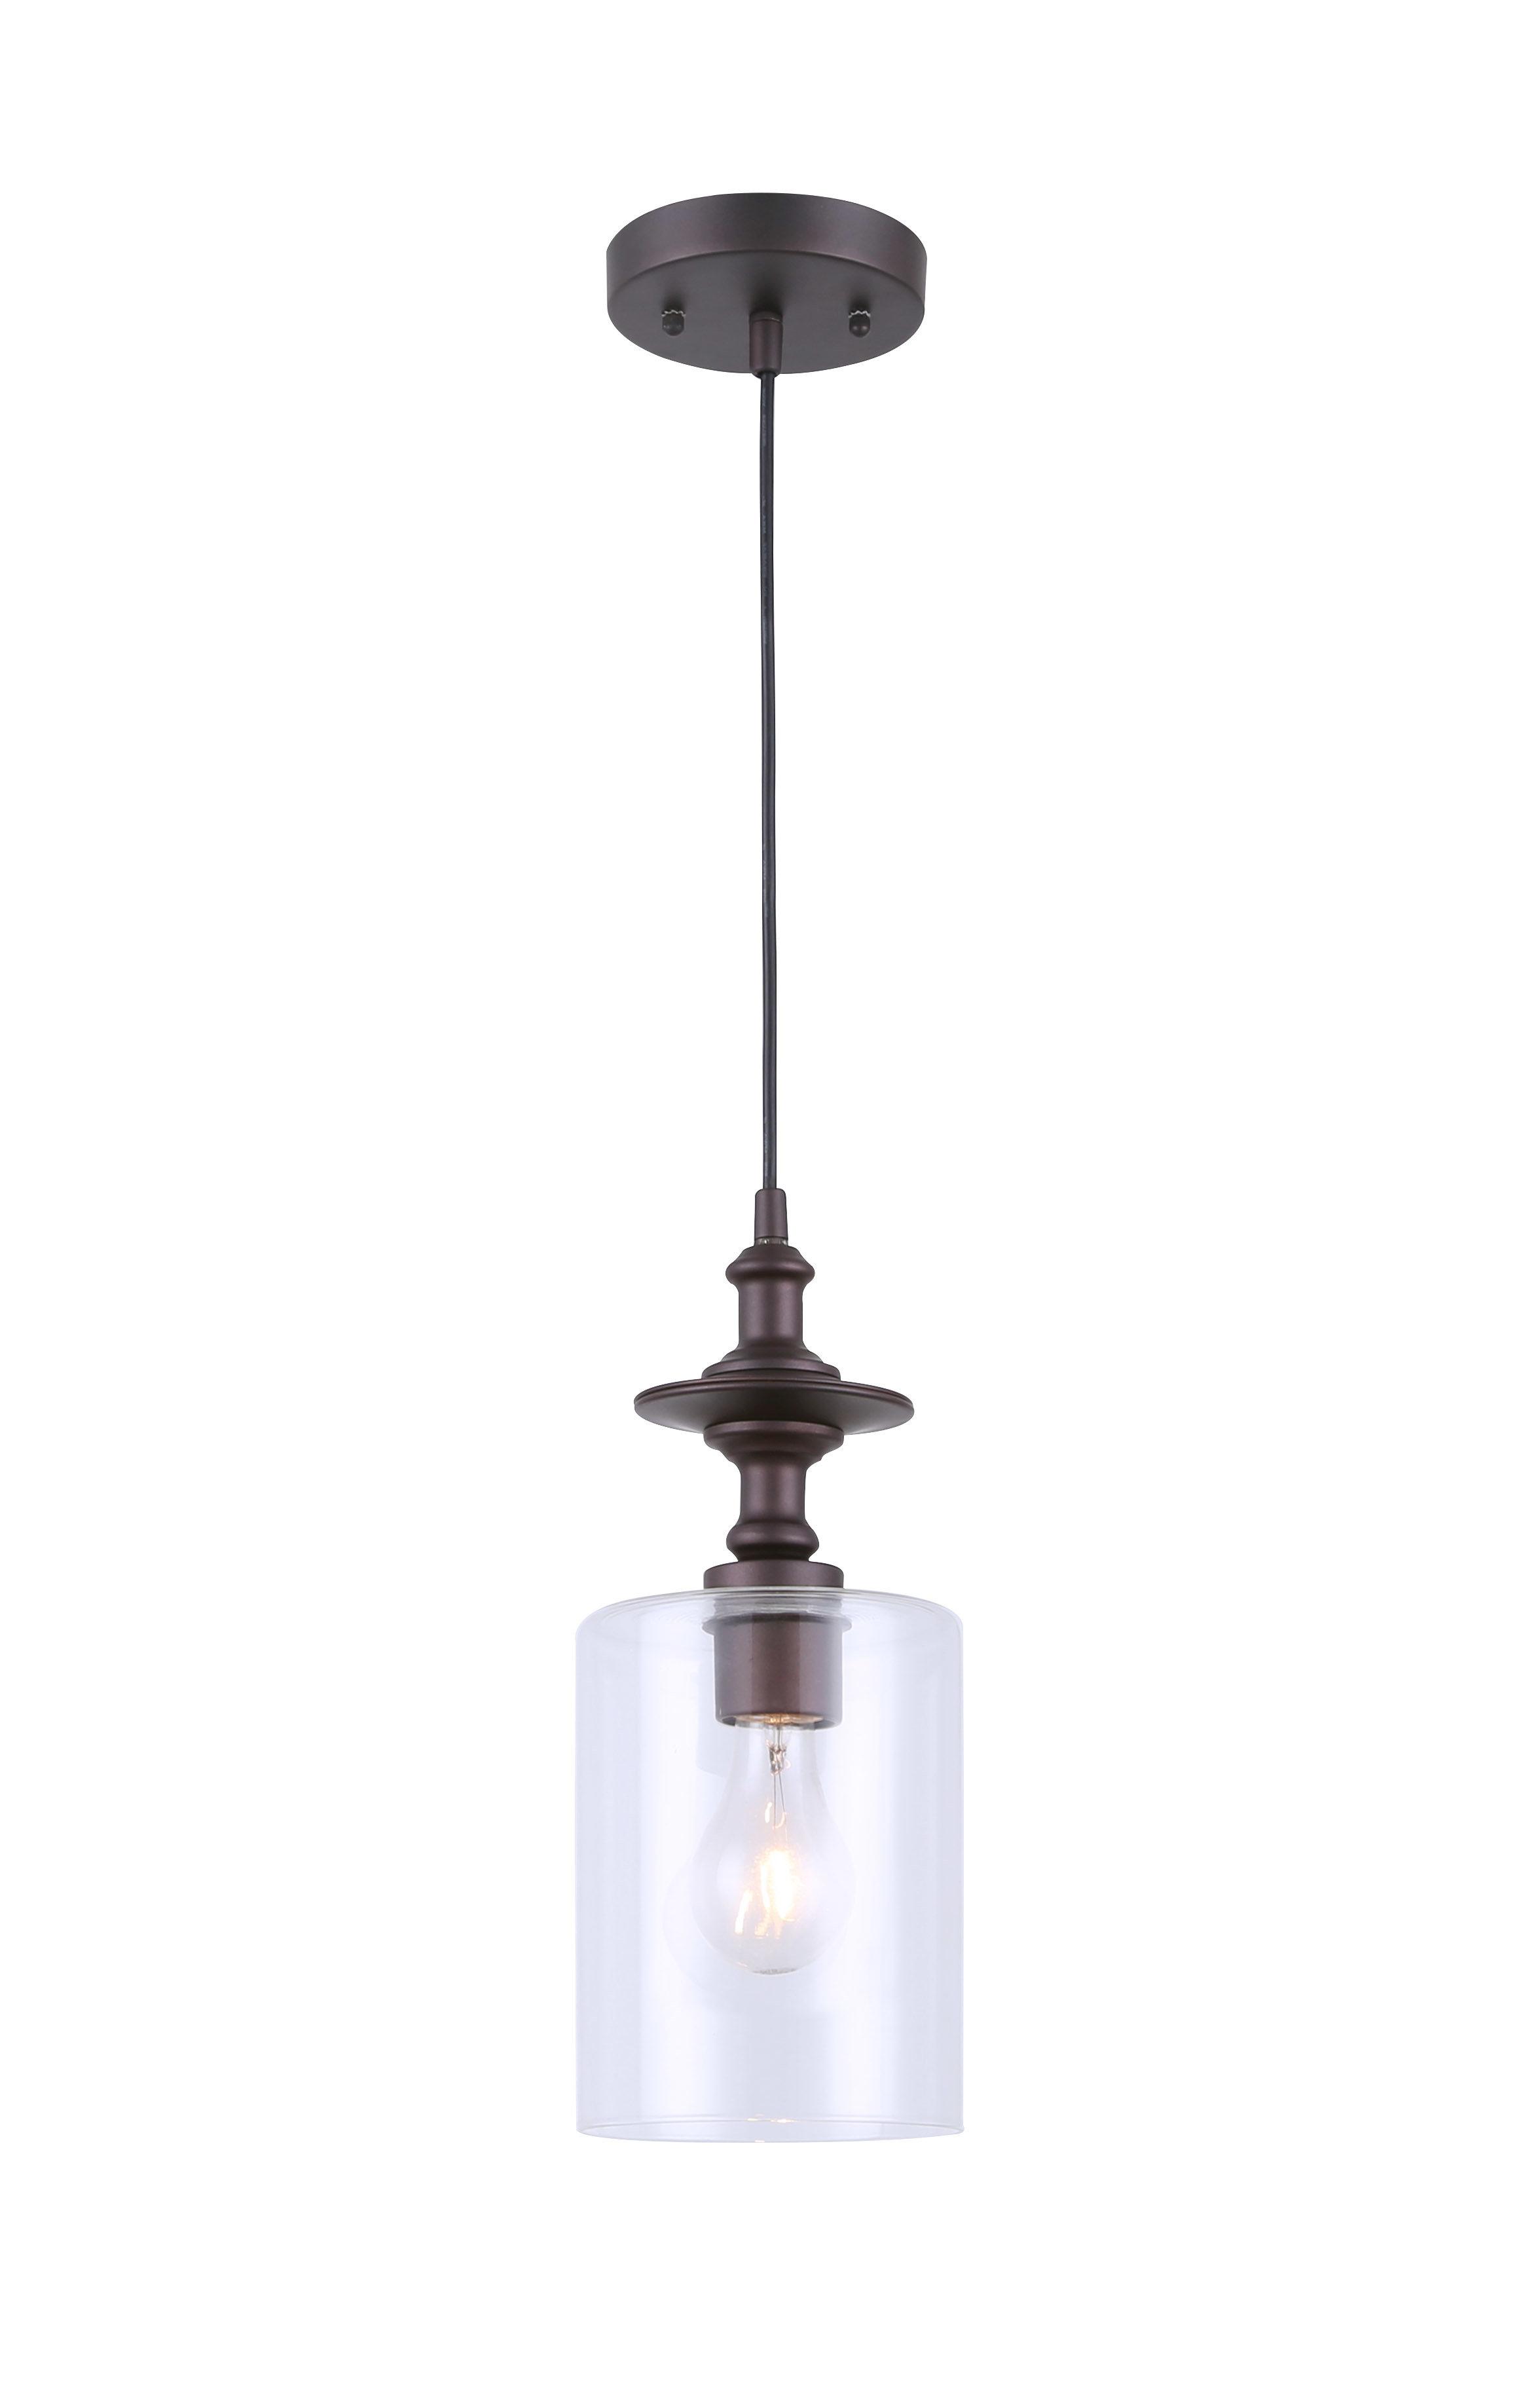 Cylinder Pendant Lighting | Joss & Main with Fennia 1-Light Single Cylinder Pendants (Image 5 of 30)